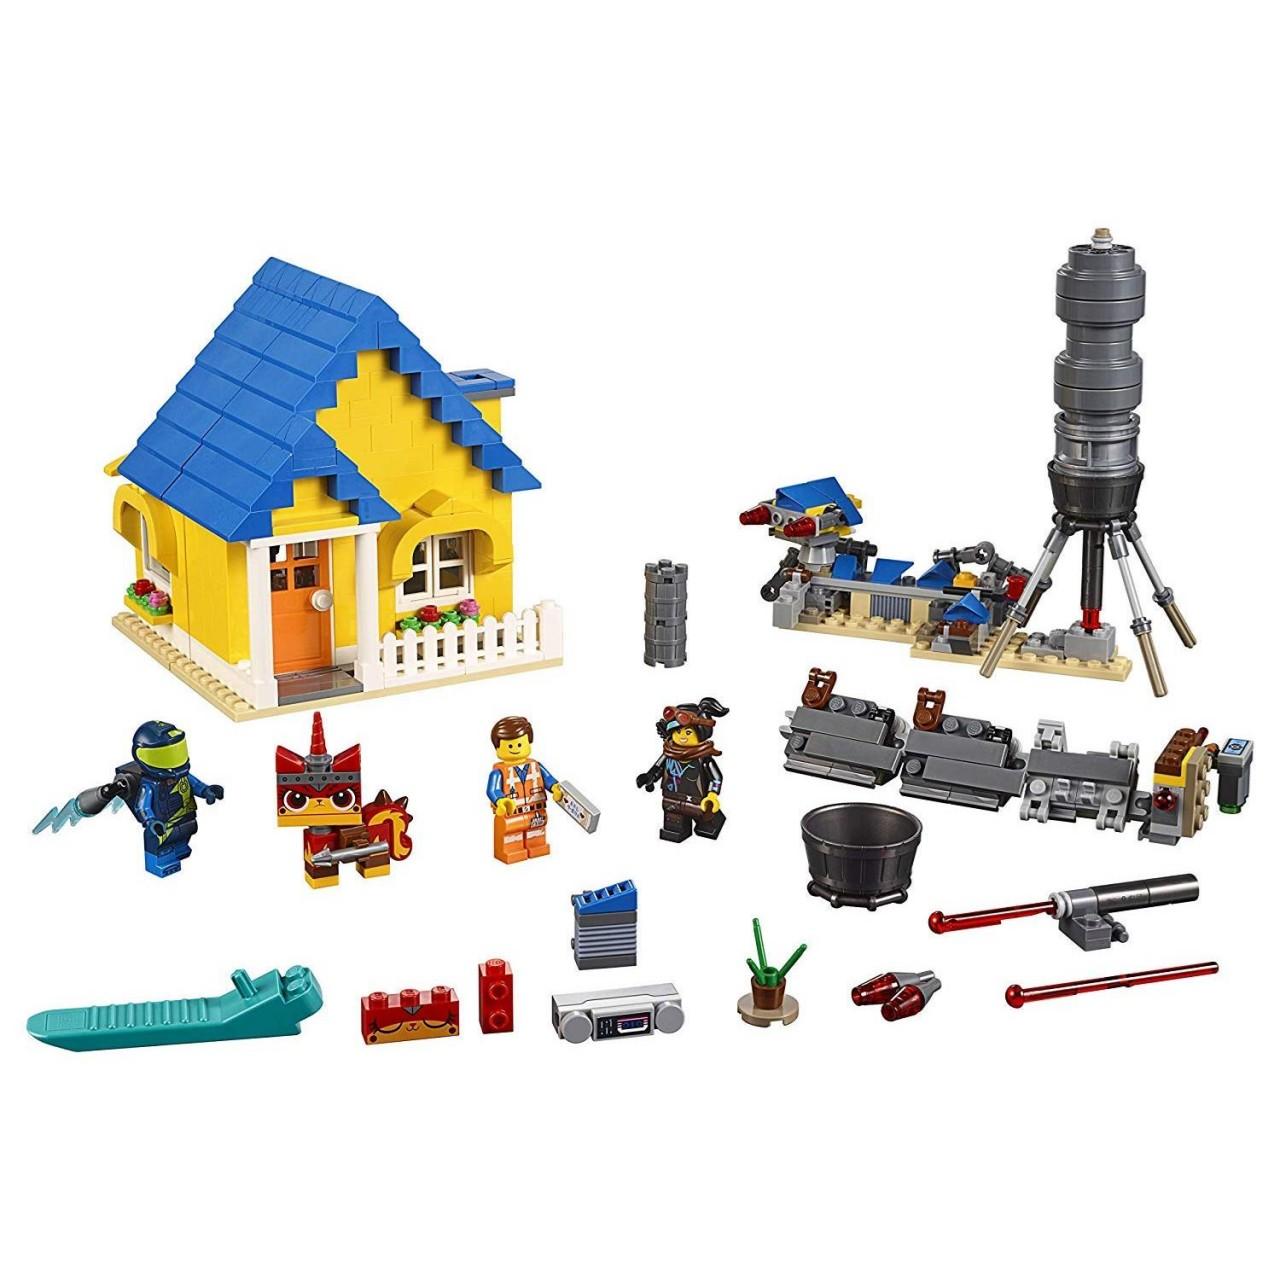 THE LEGO MOVIE 2 70831 Emmets Traumhaus/Rettungsrakete!